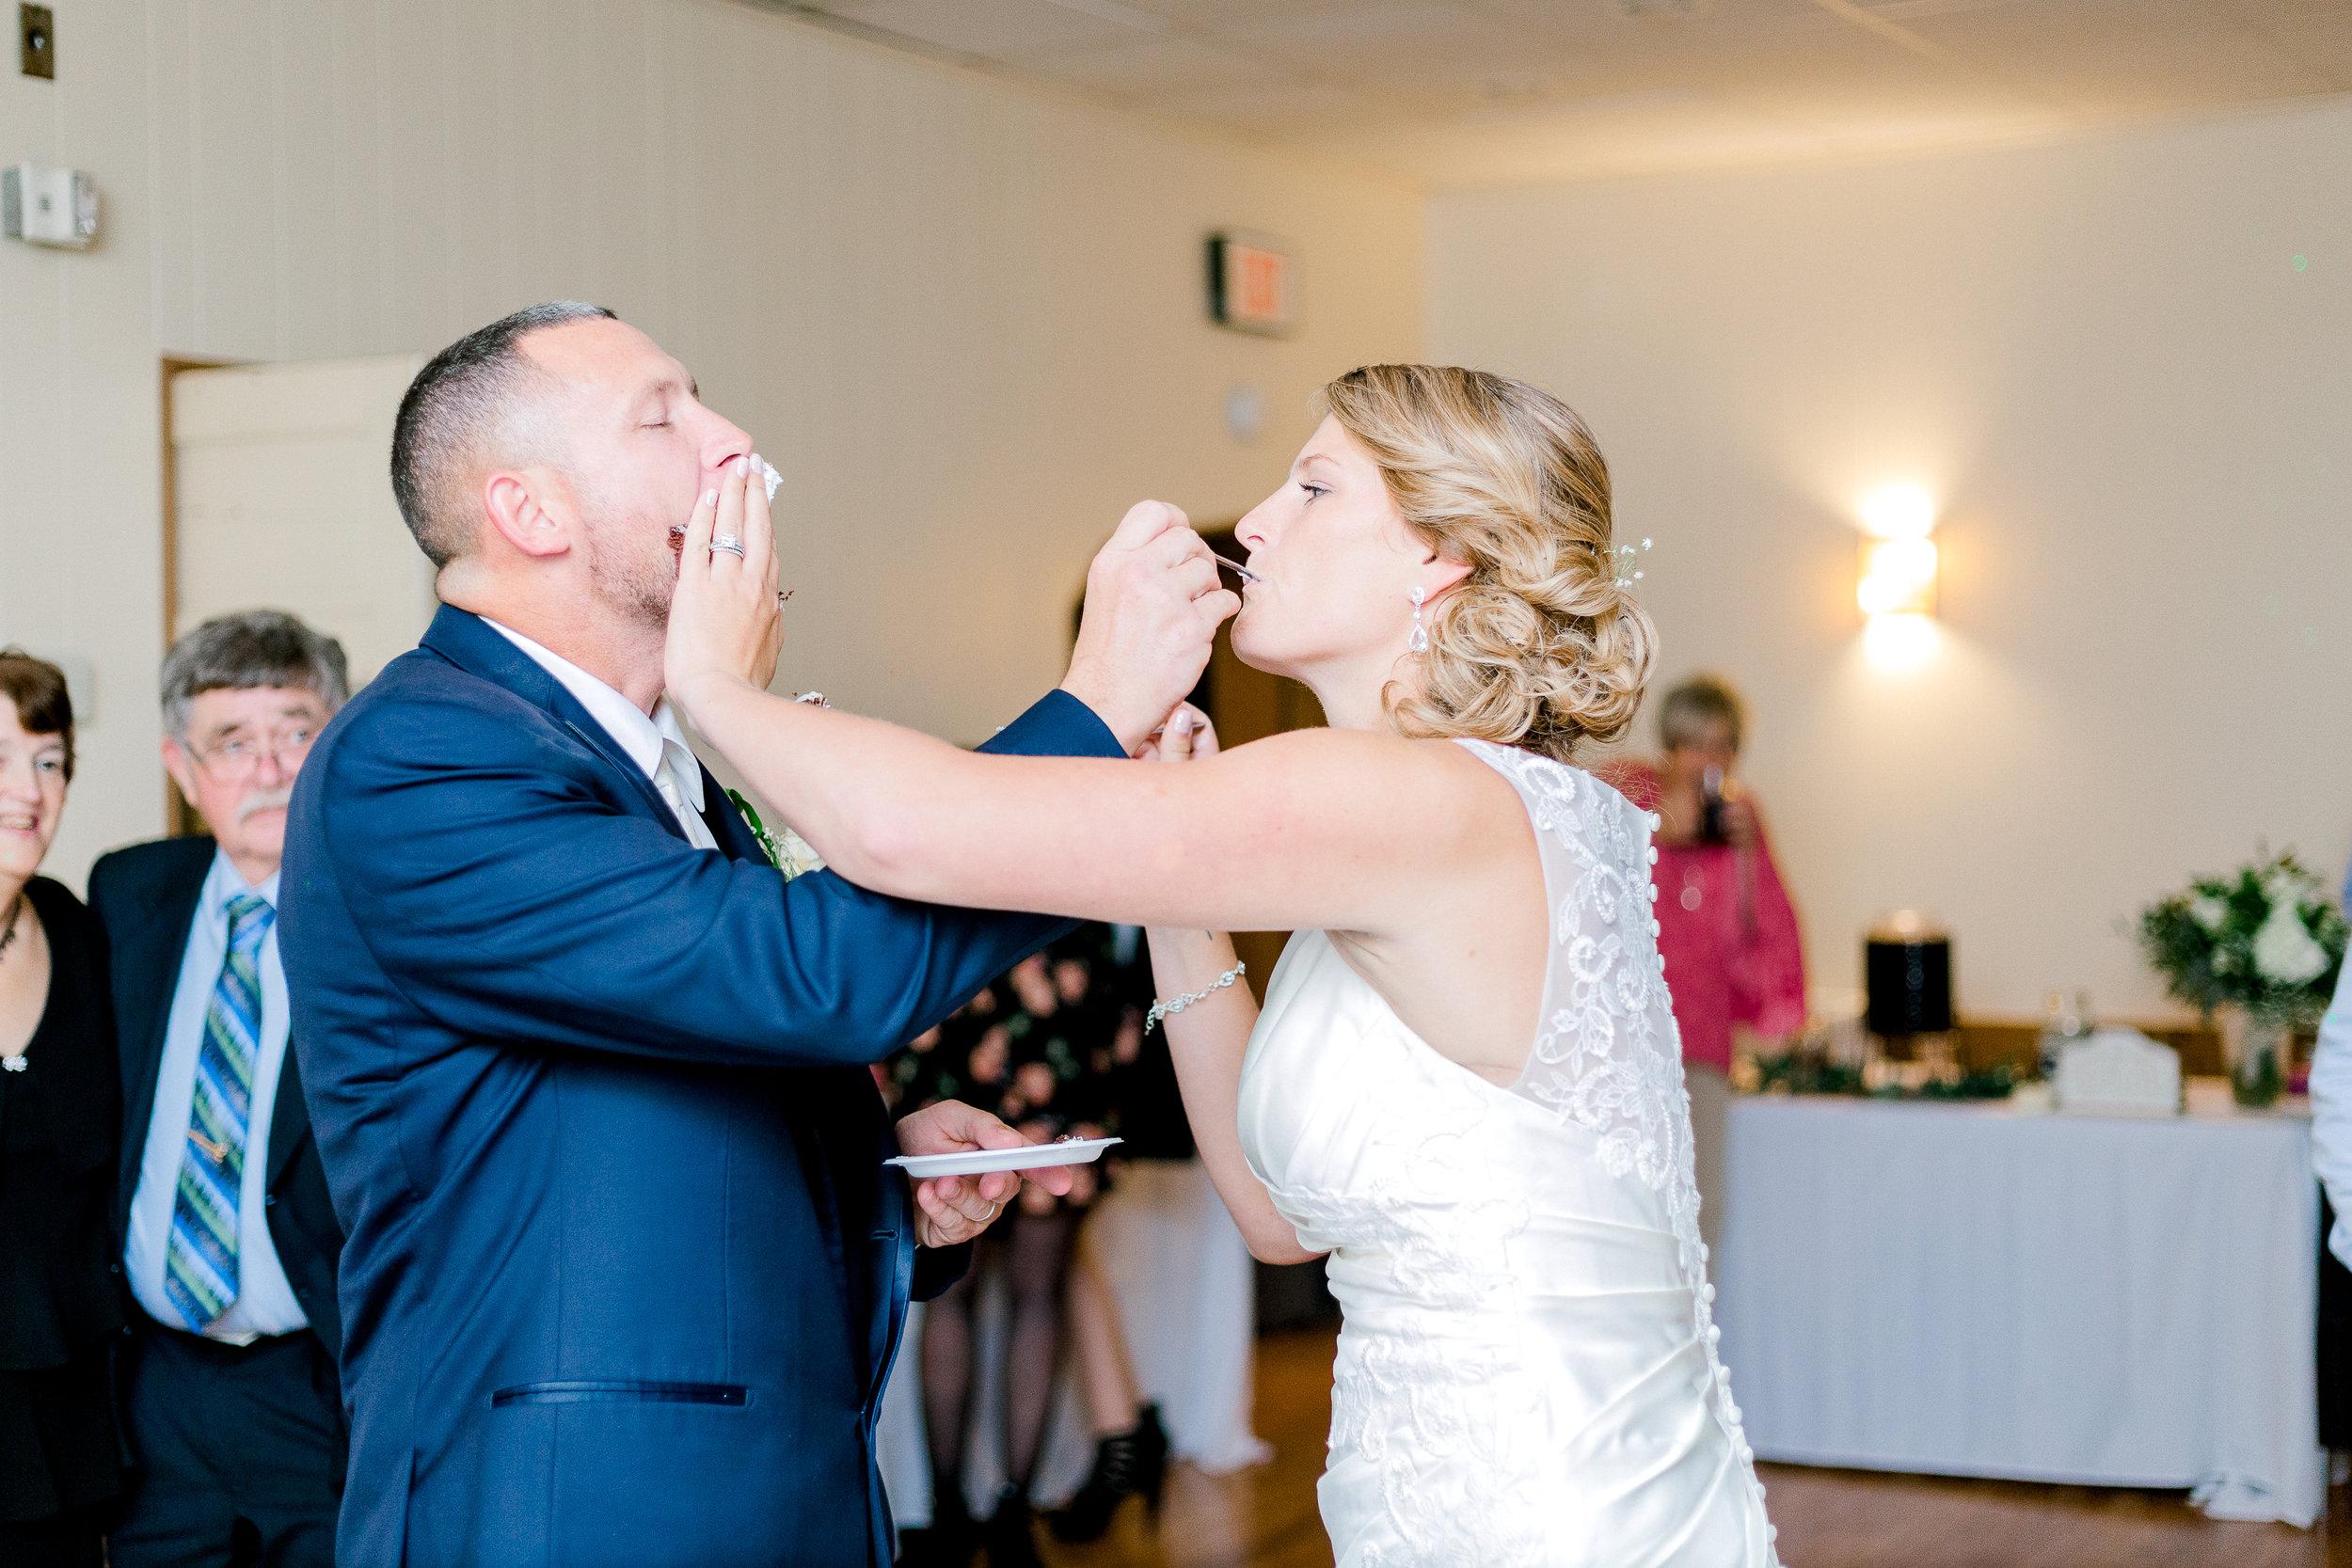 Pennsylvania October Fall Lehigh Valley wedding and lifestyle photographer Lytle Photo Co (154 of 167).jpg